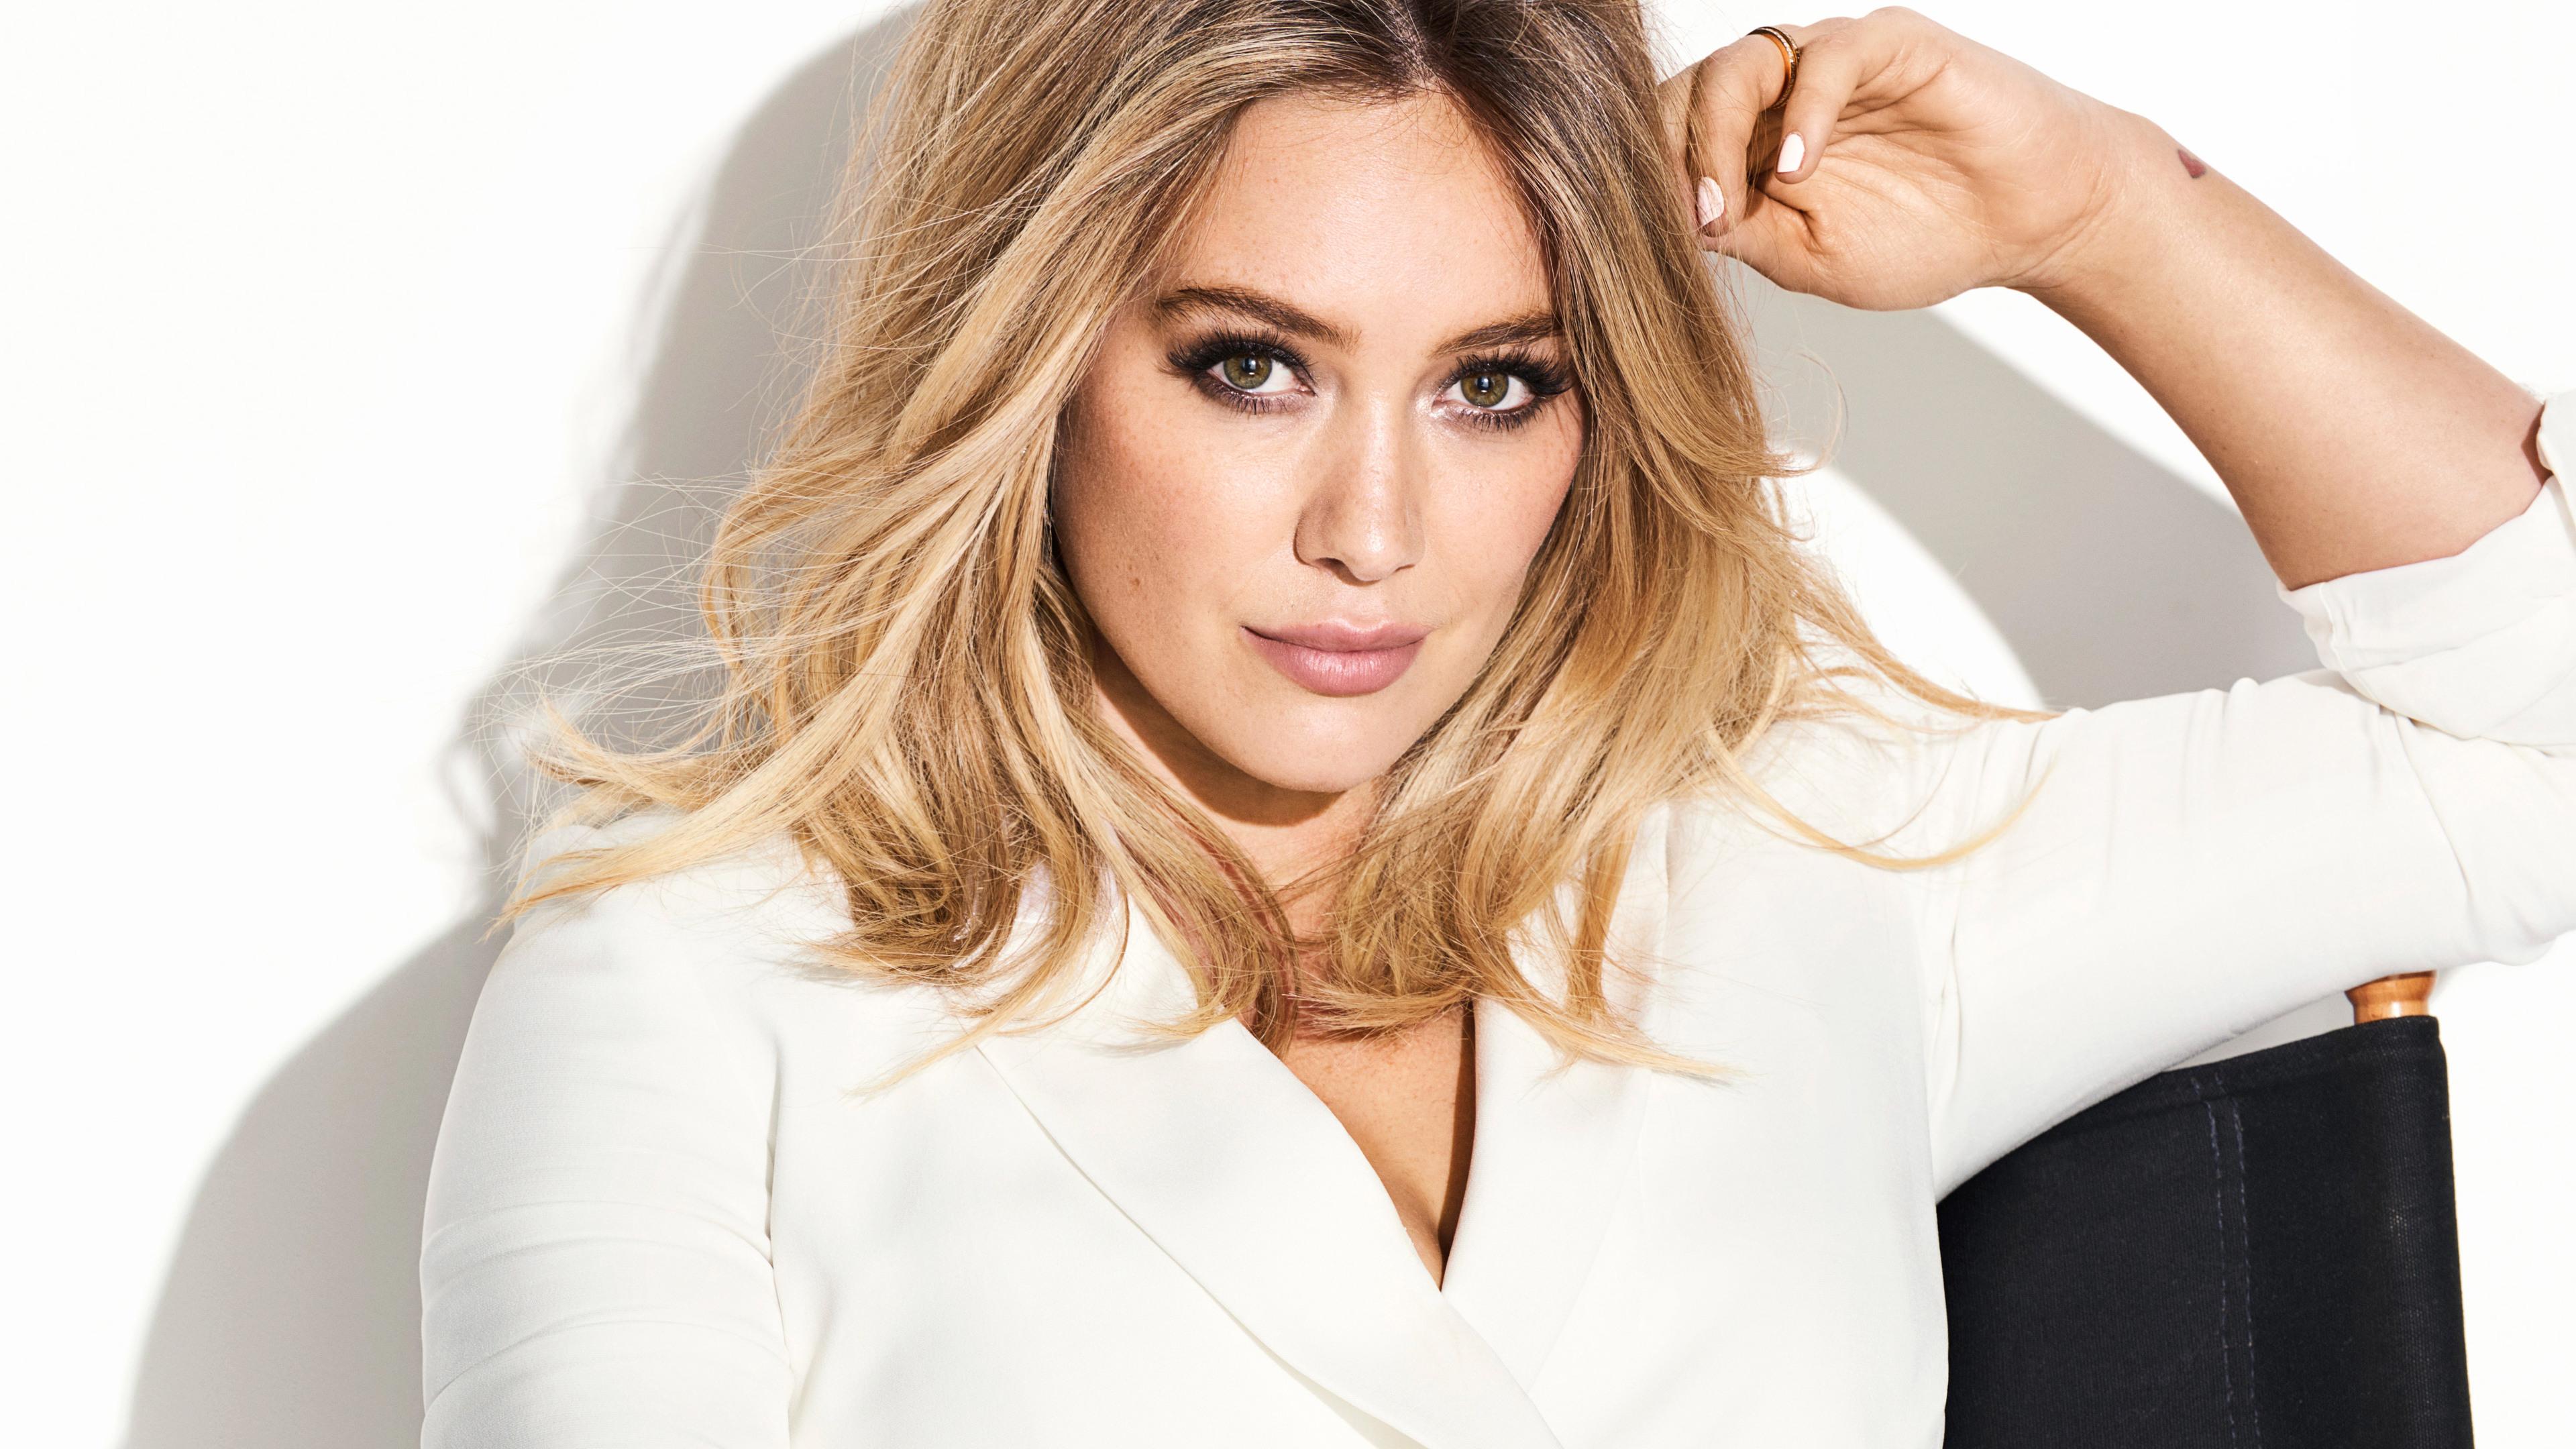 hilary duff cosmopolitan 2018 5k 1536861458 - Hilary Duff Cosmopolitan 2018 5K - hilary duff wallpapers, hd-wallpapers, girls wallpapers, celebrities wallpapers, 5k wallpapers, 4k-wallpapers